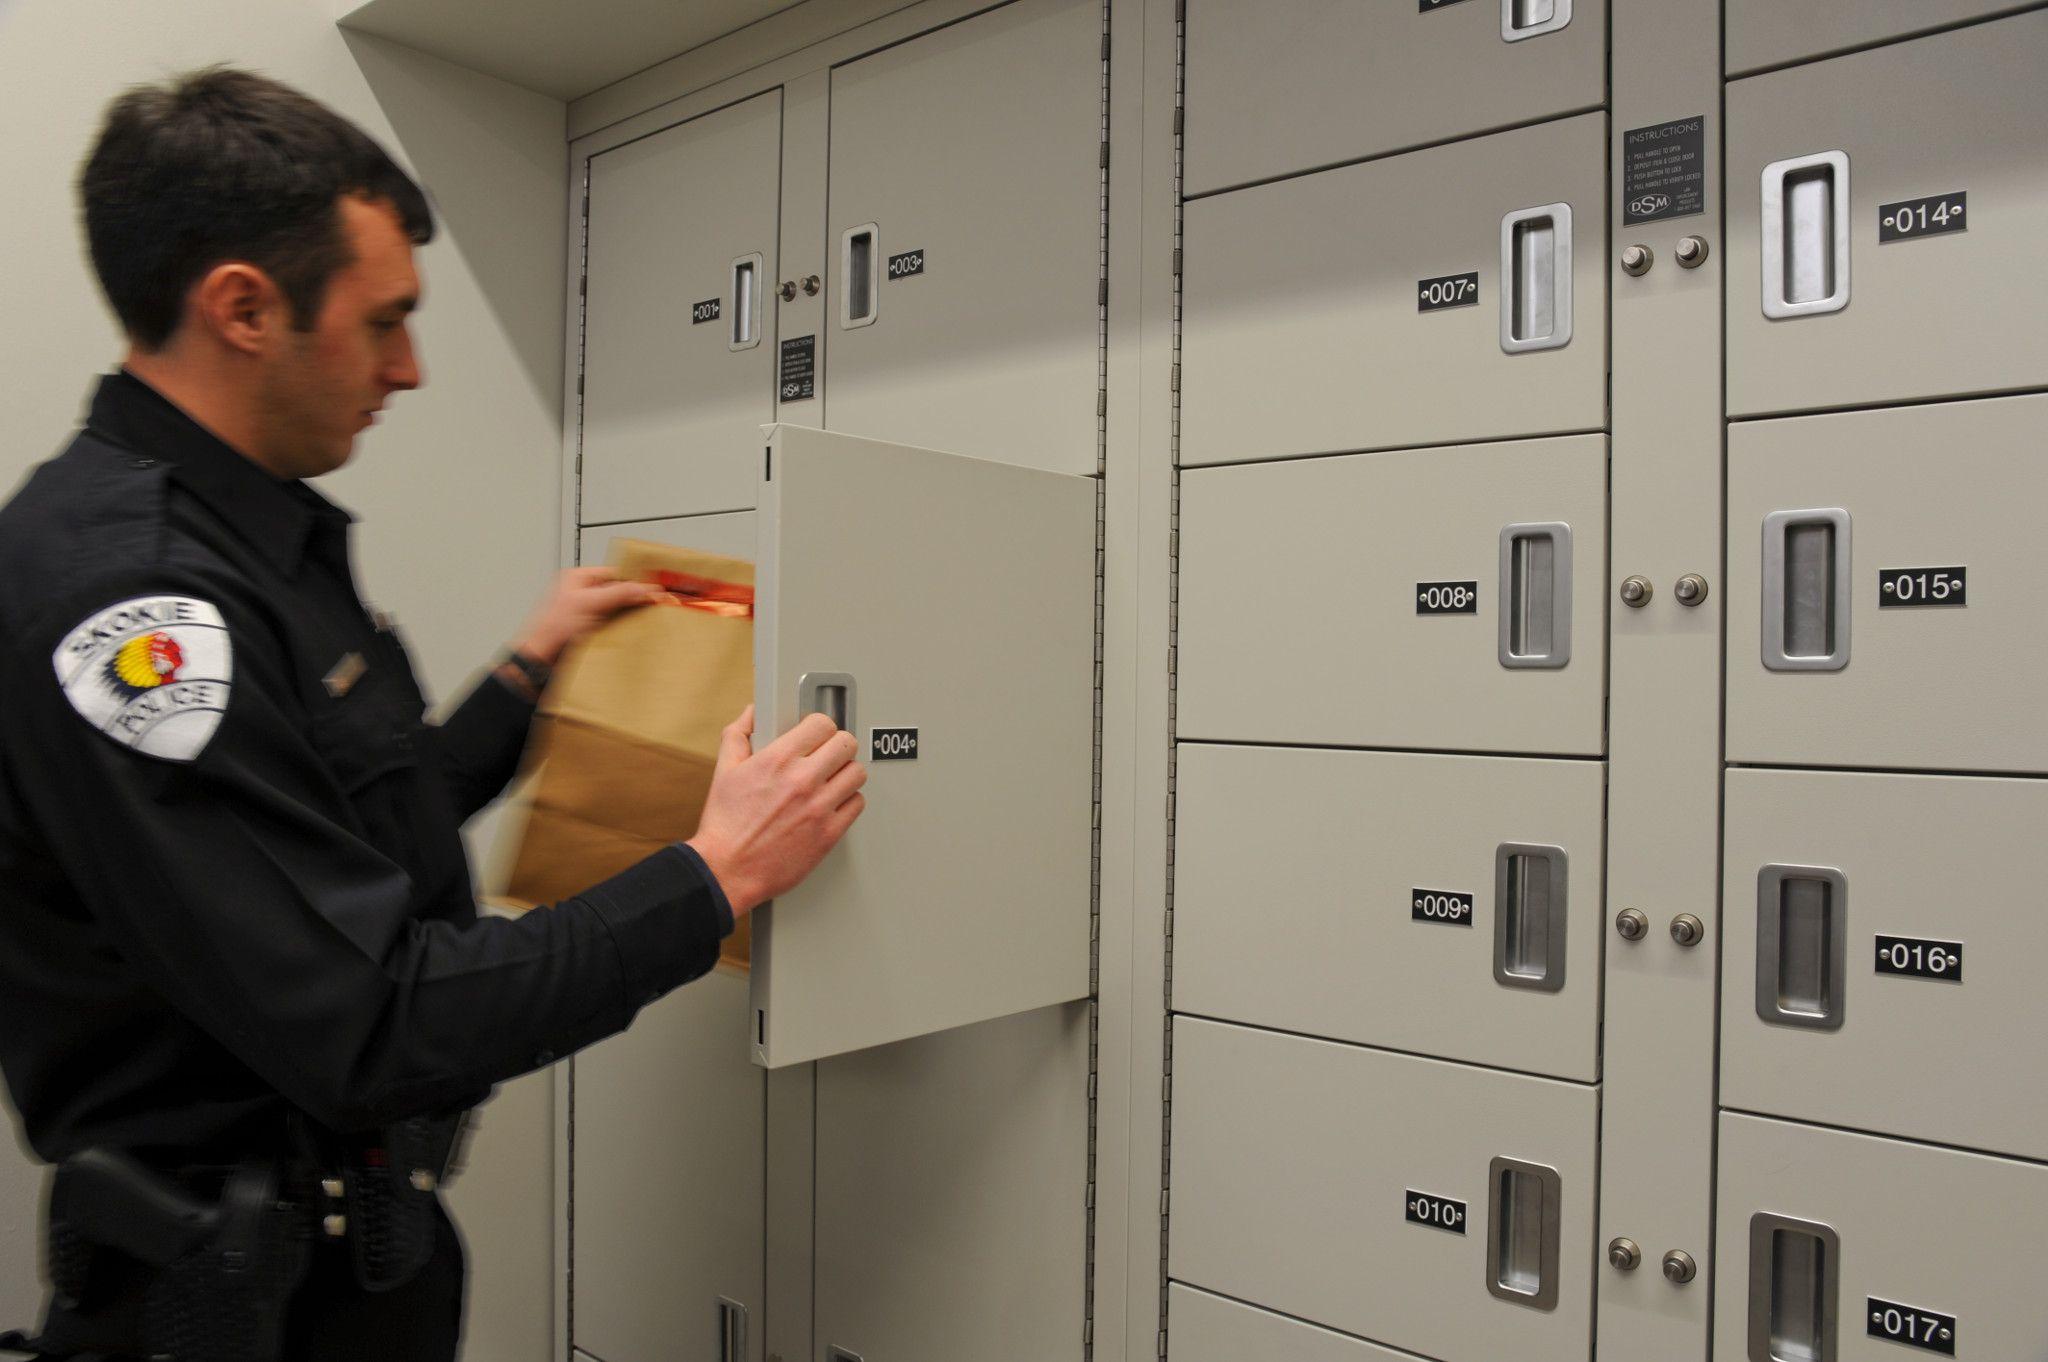 Police officer depositing evidence into secure pass thru locker